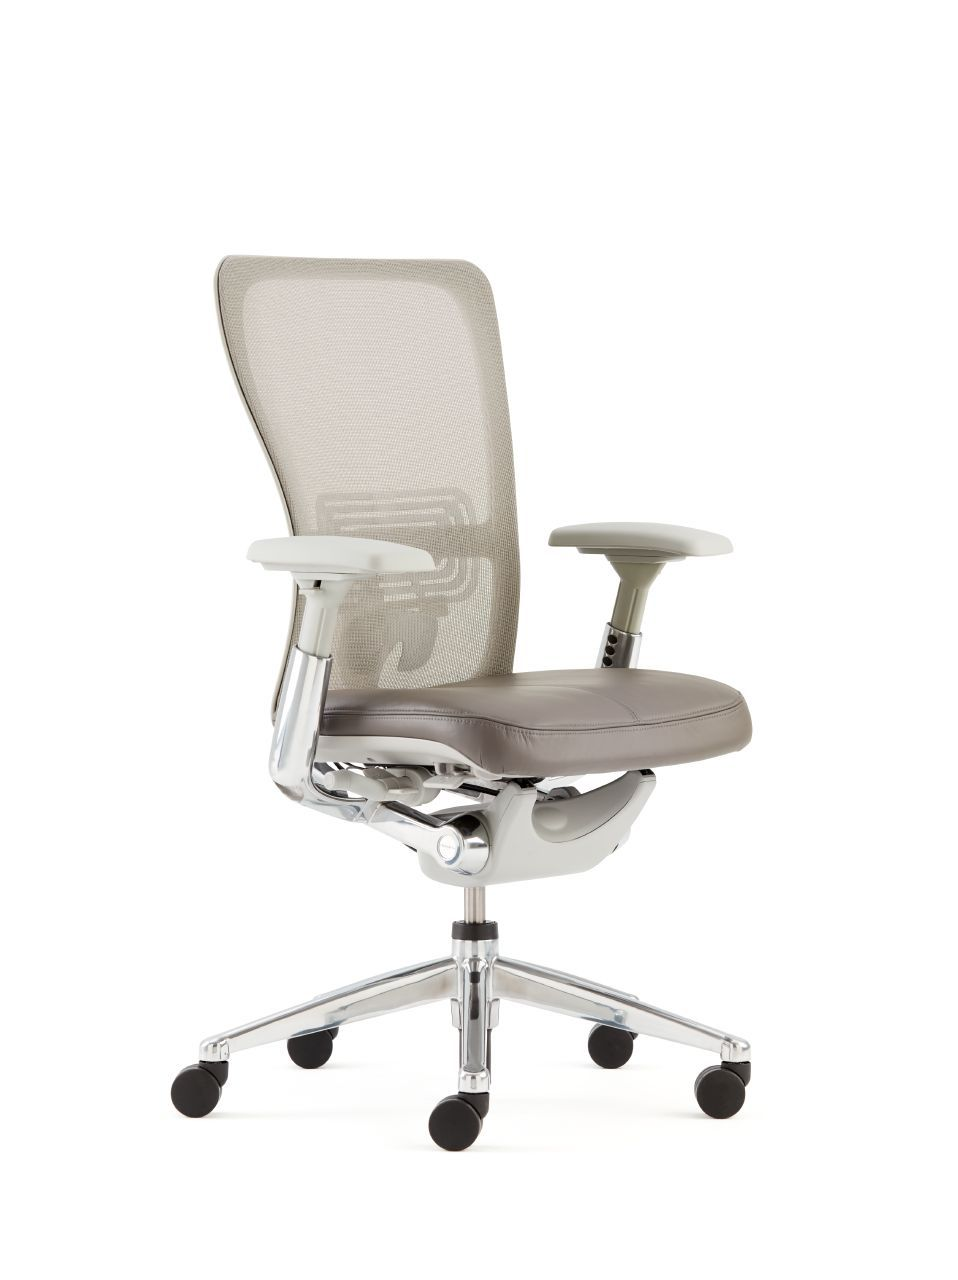 haworth zody chair steel armless ergonomic desk chairs